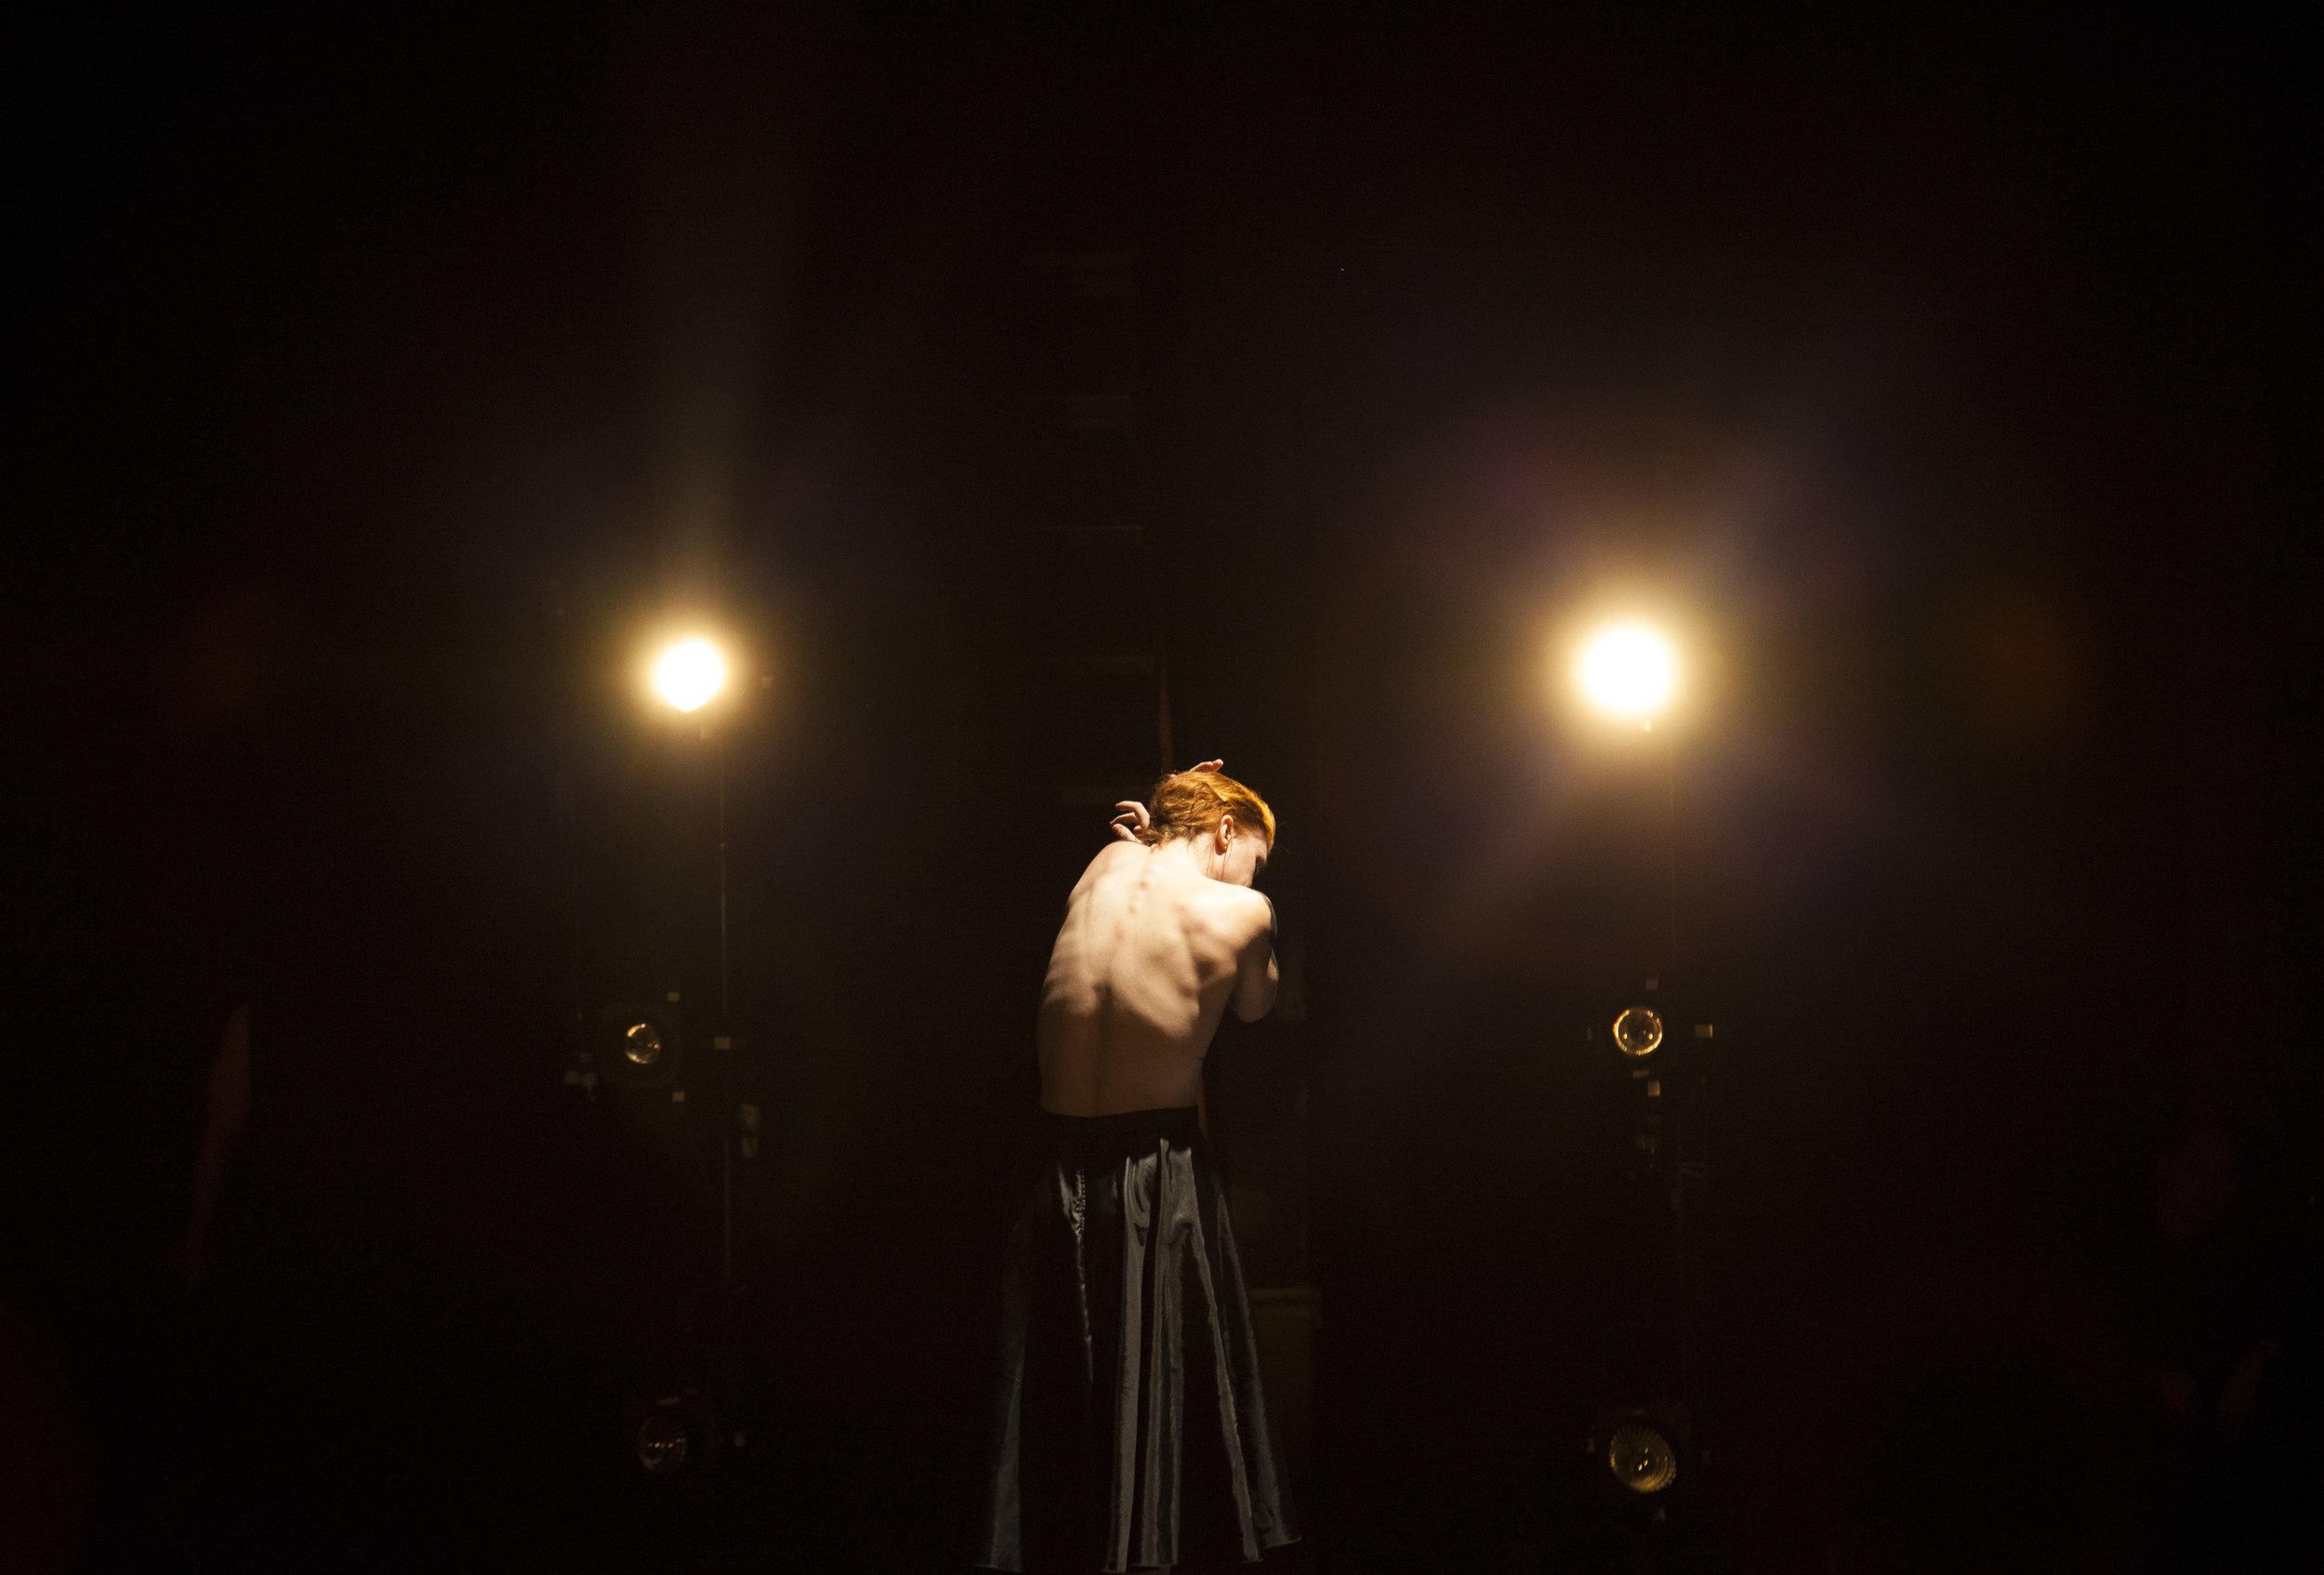 Patty Petronello ©  Hannah Altman 2016